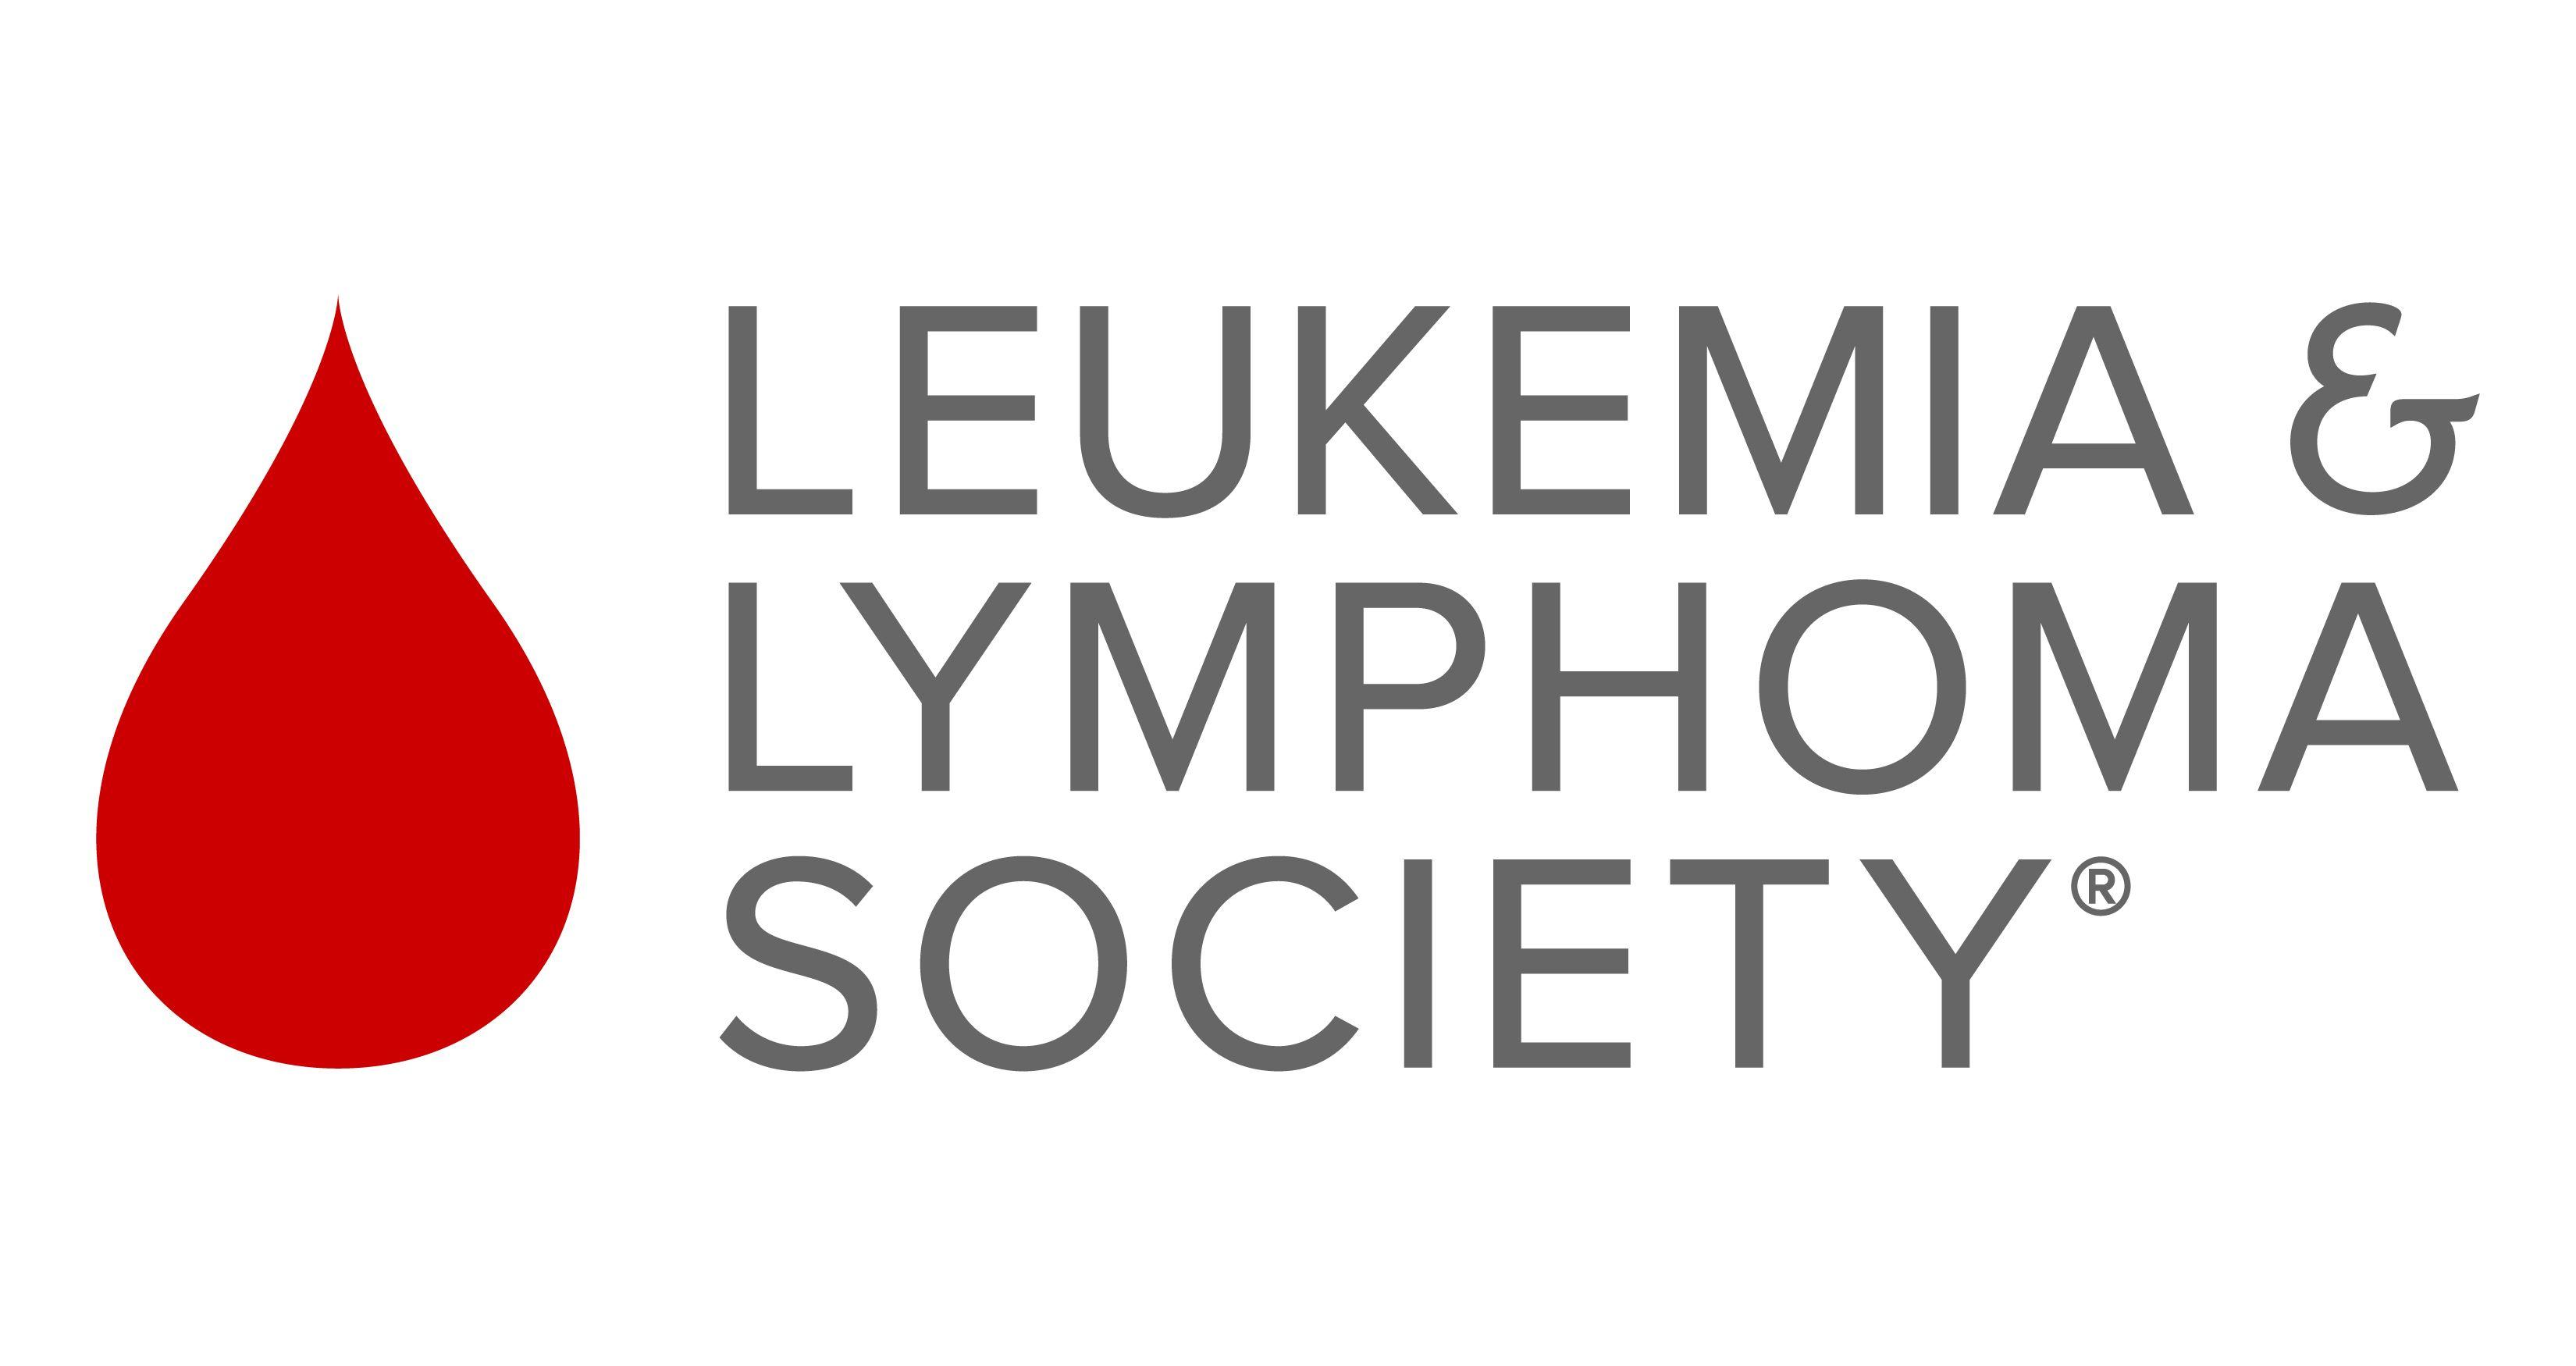 Advocacy Groups | <b>Leukemia & Lymphoma Society</b>